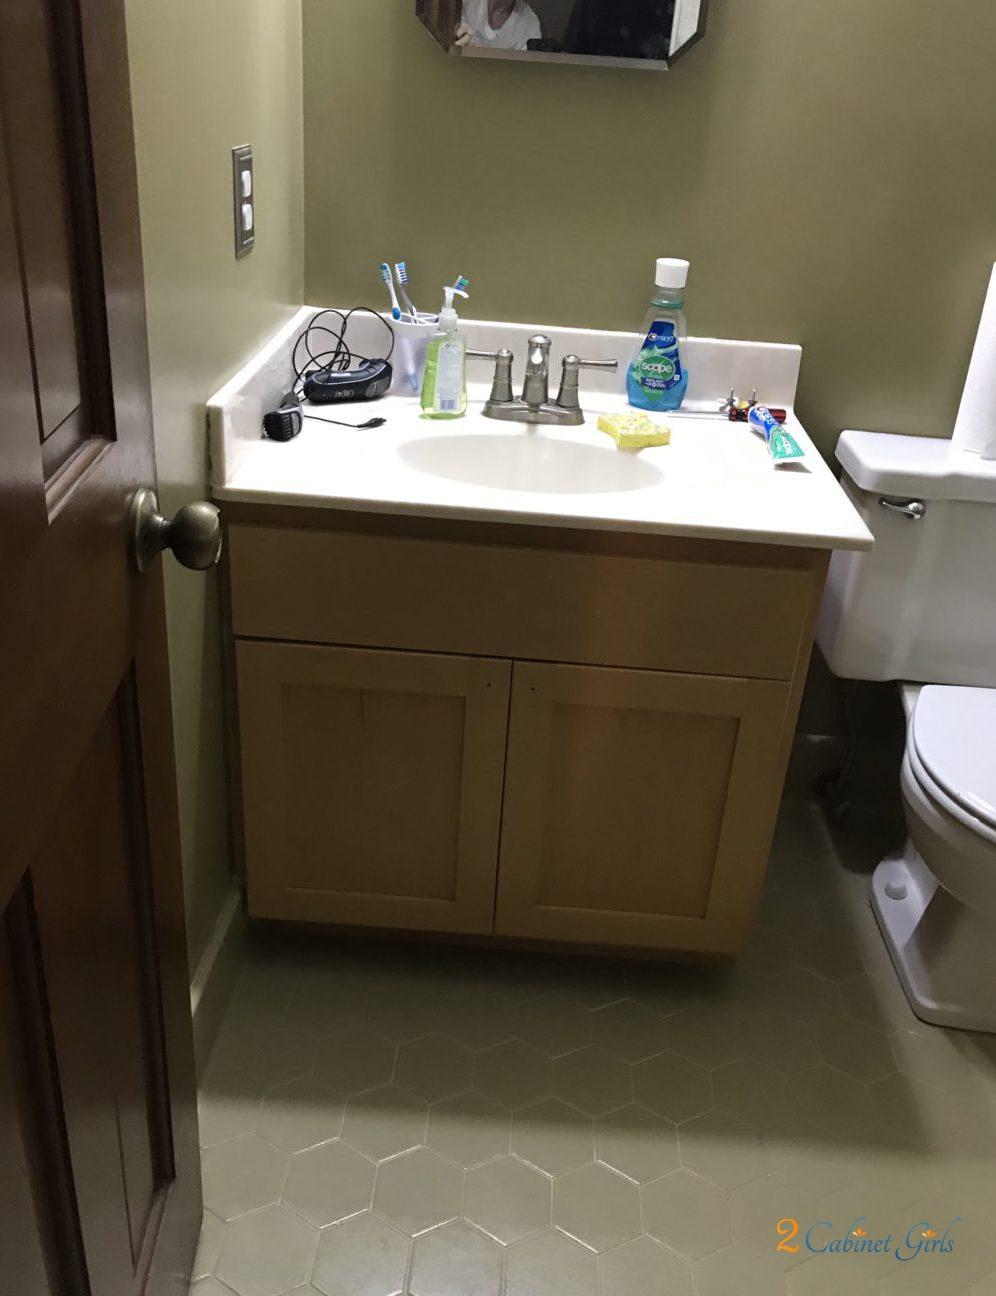 Sedona Brown Bathroom 2 Cabinet Girls